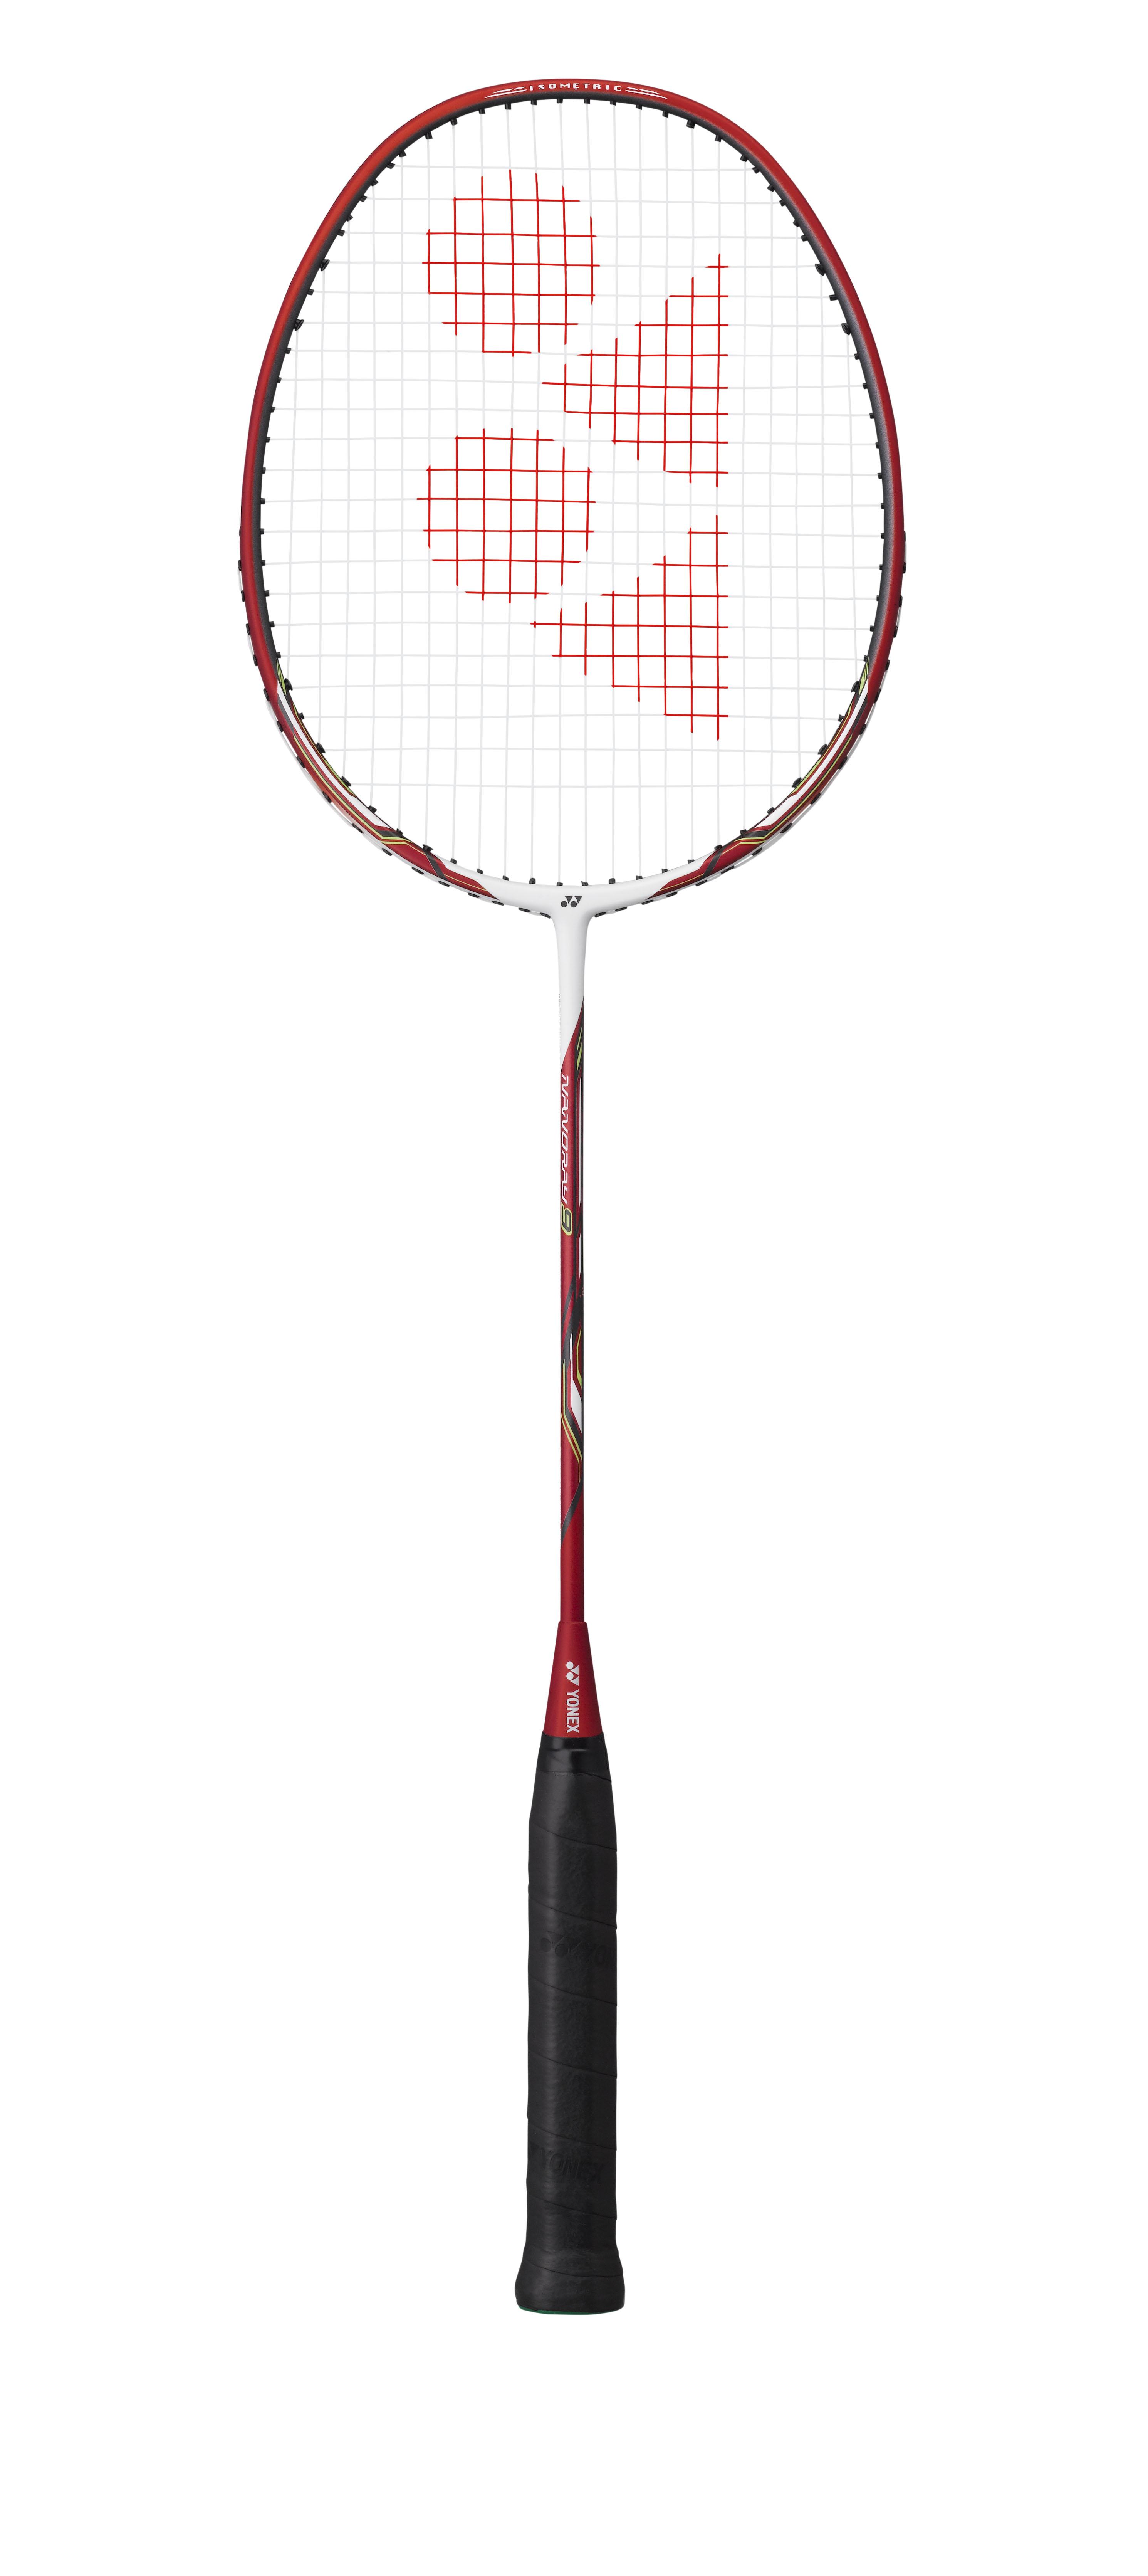 Yonex Nanoray 9 Racchetta Badminton Racchetta Da Badminton Racchetta -  - ebay.it